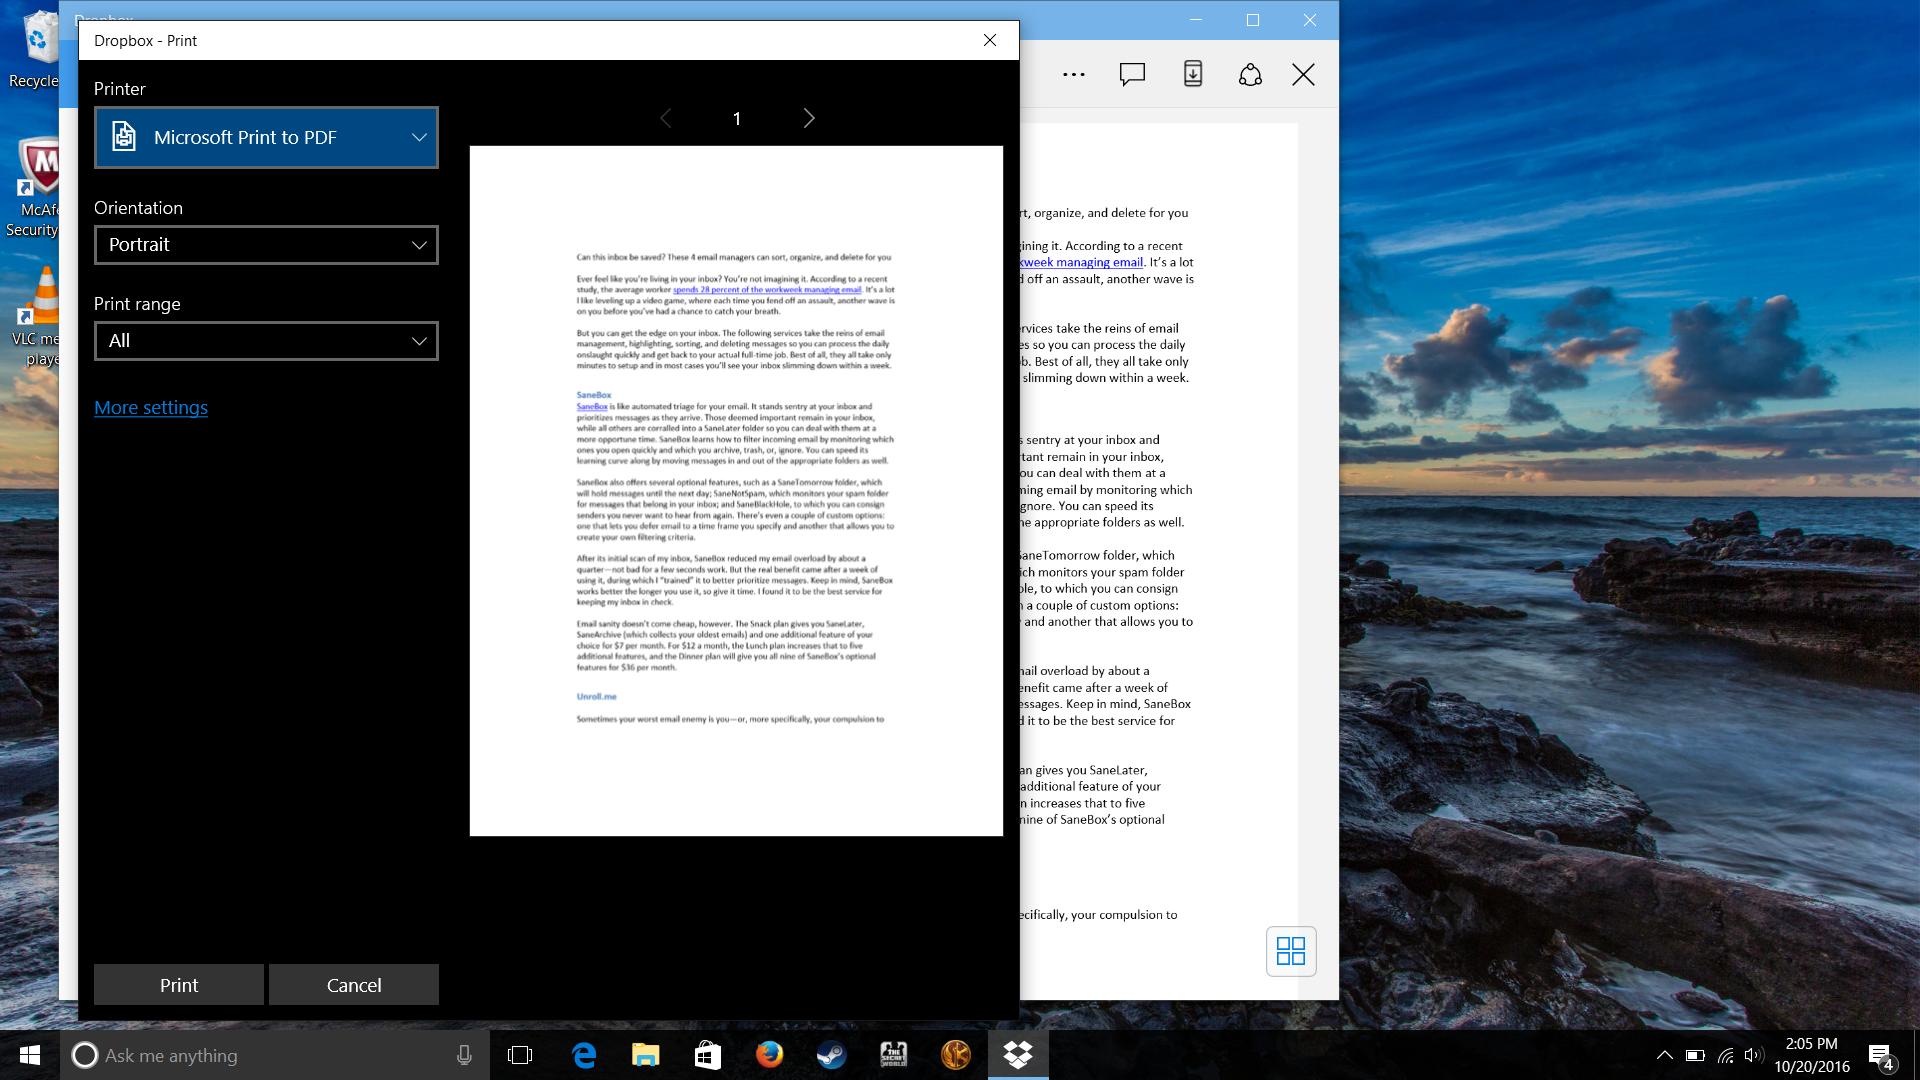 Windows 10 tools that will kickstart your productivity pcworld